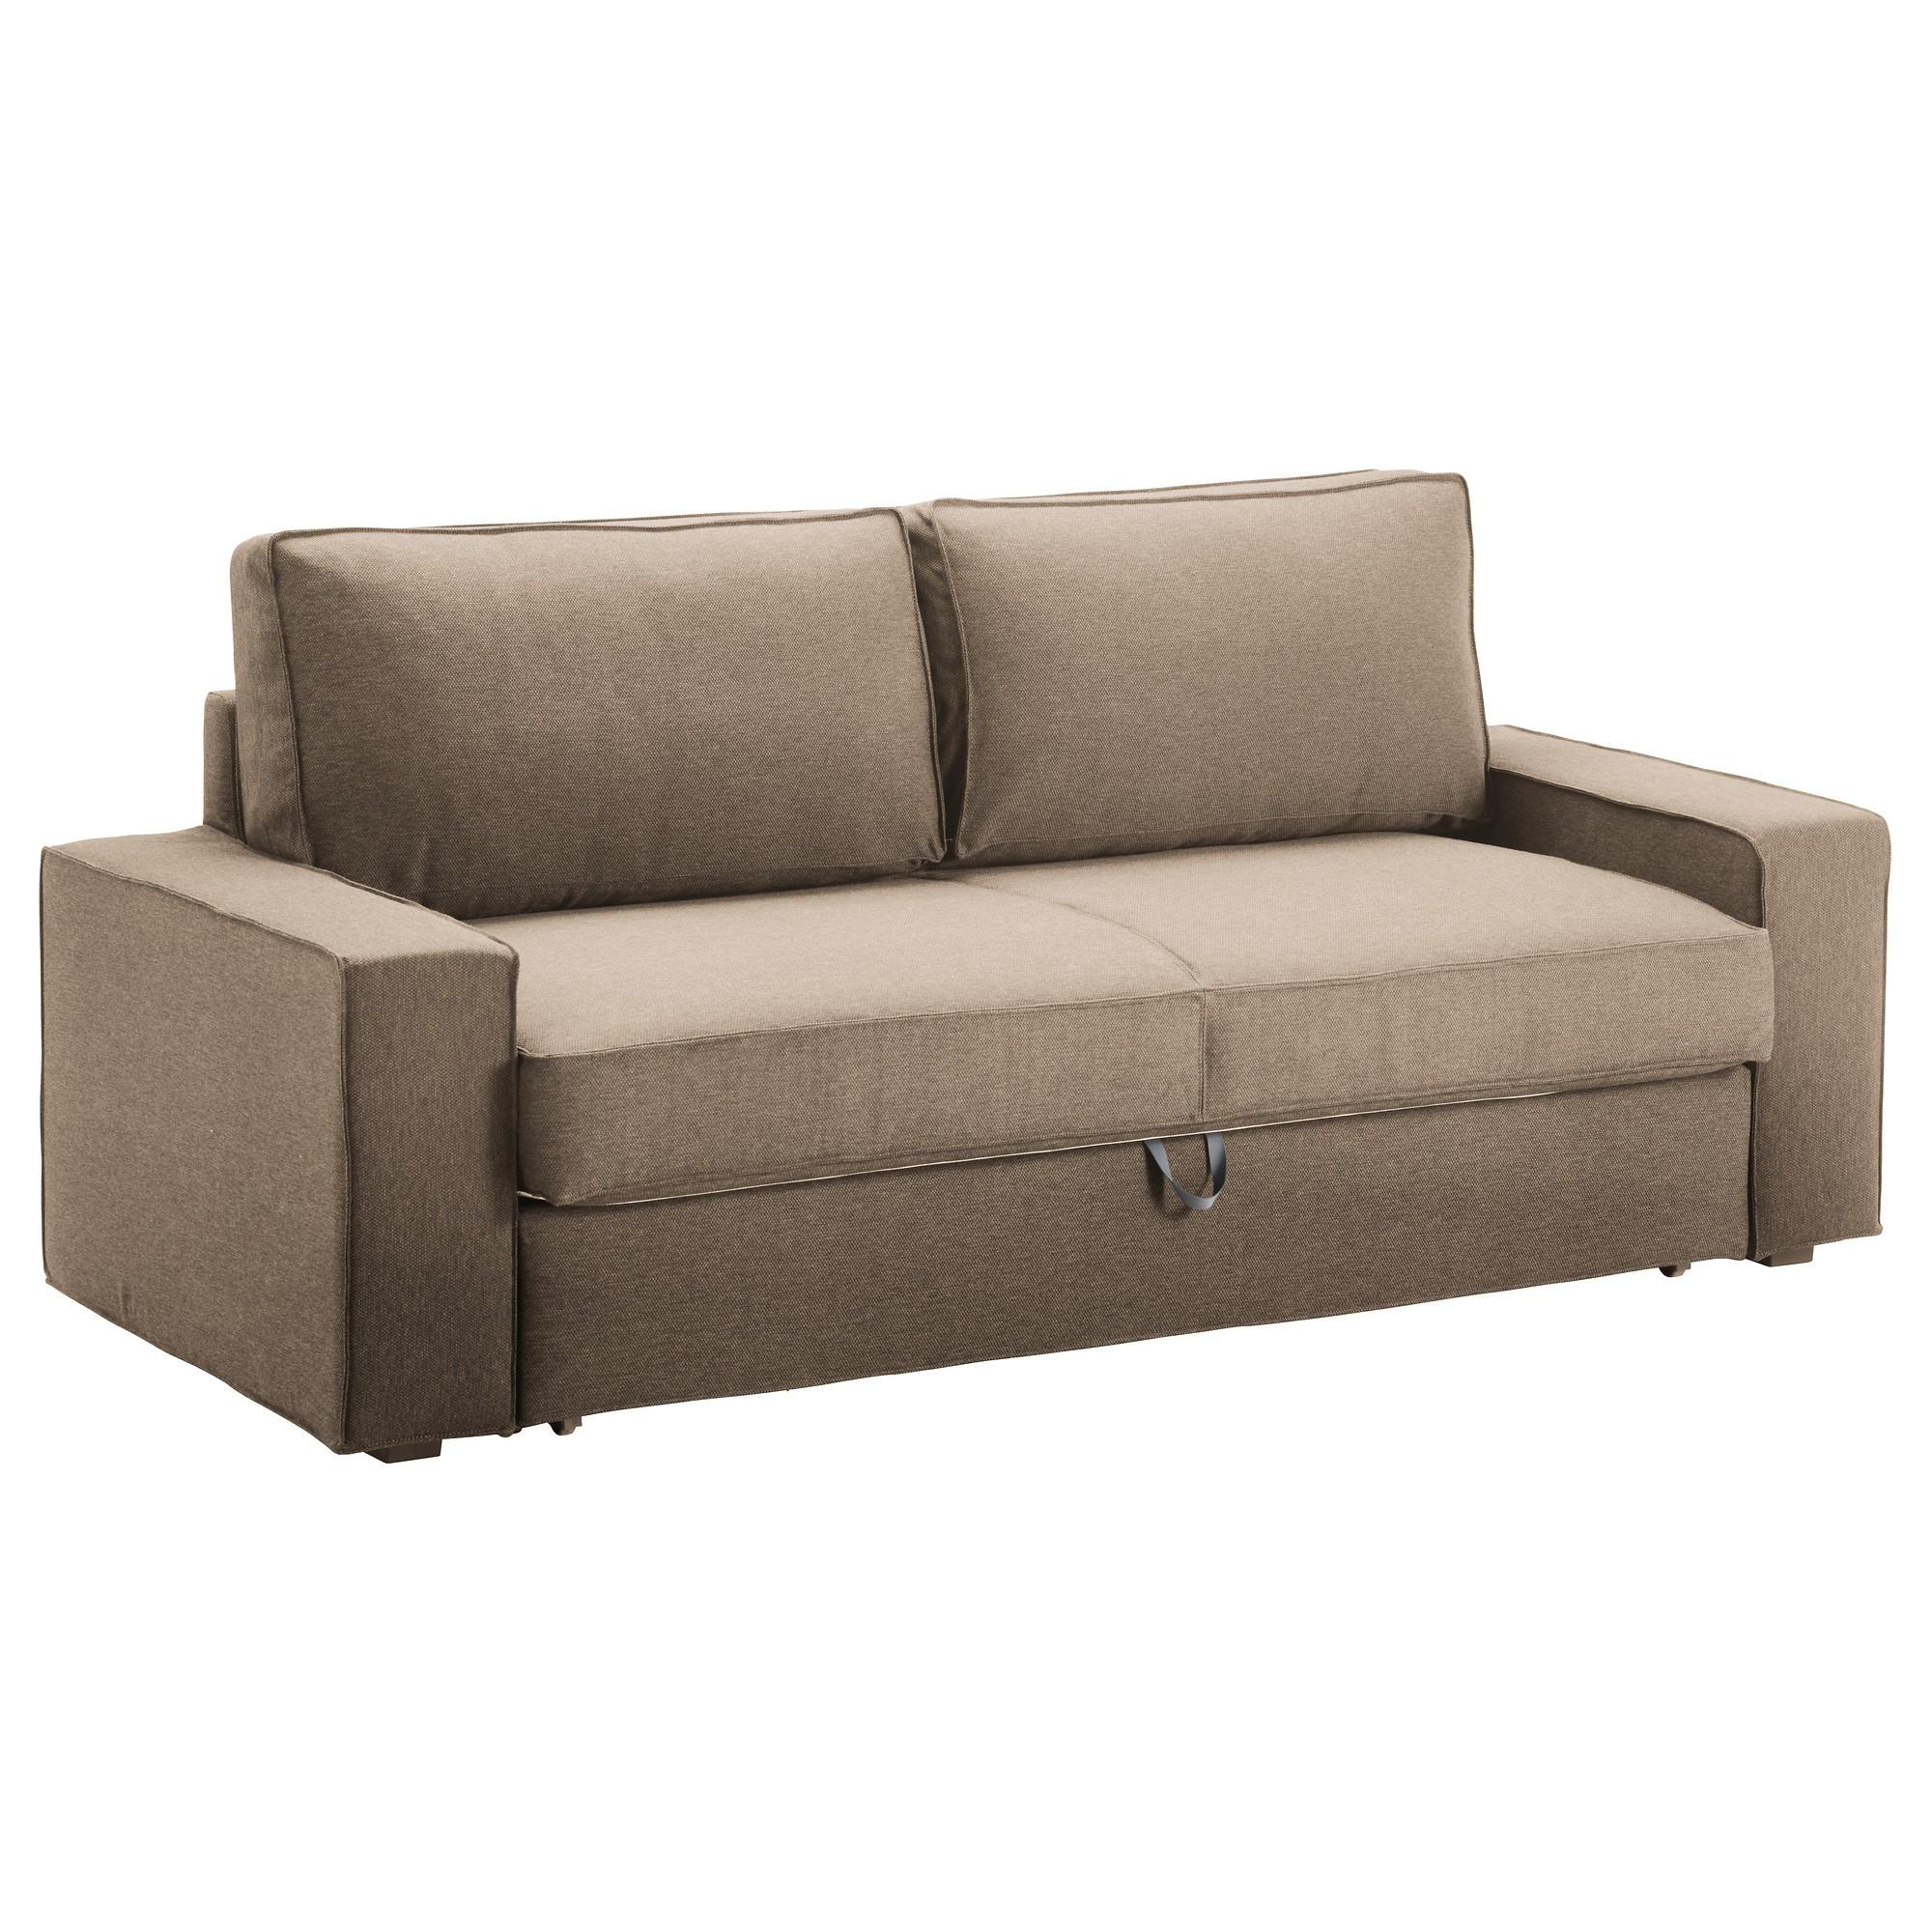 Canape Convertible Ikea Bleu